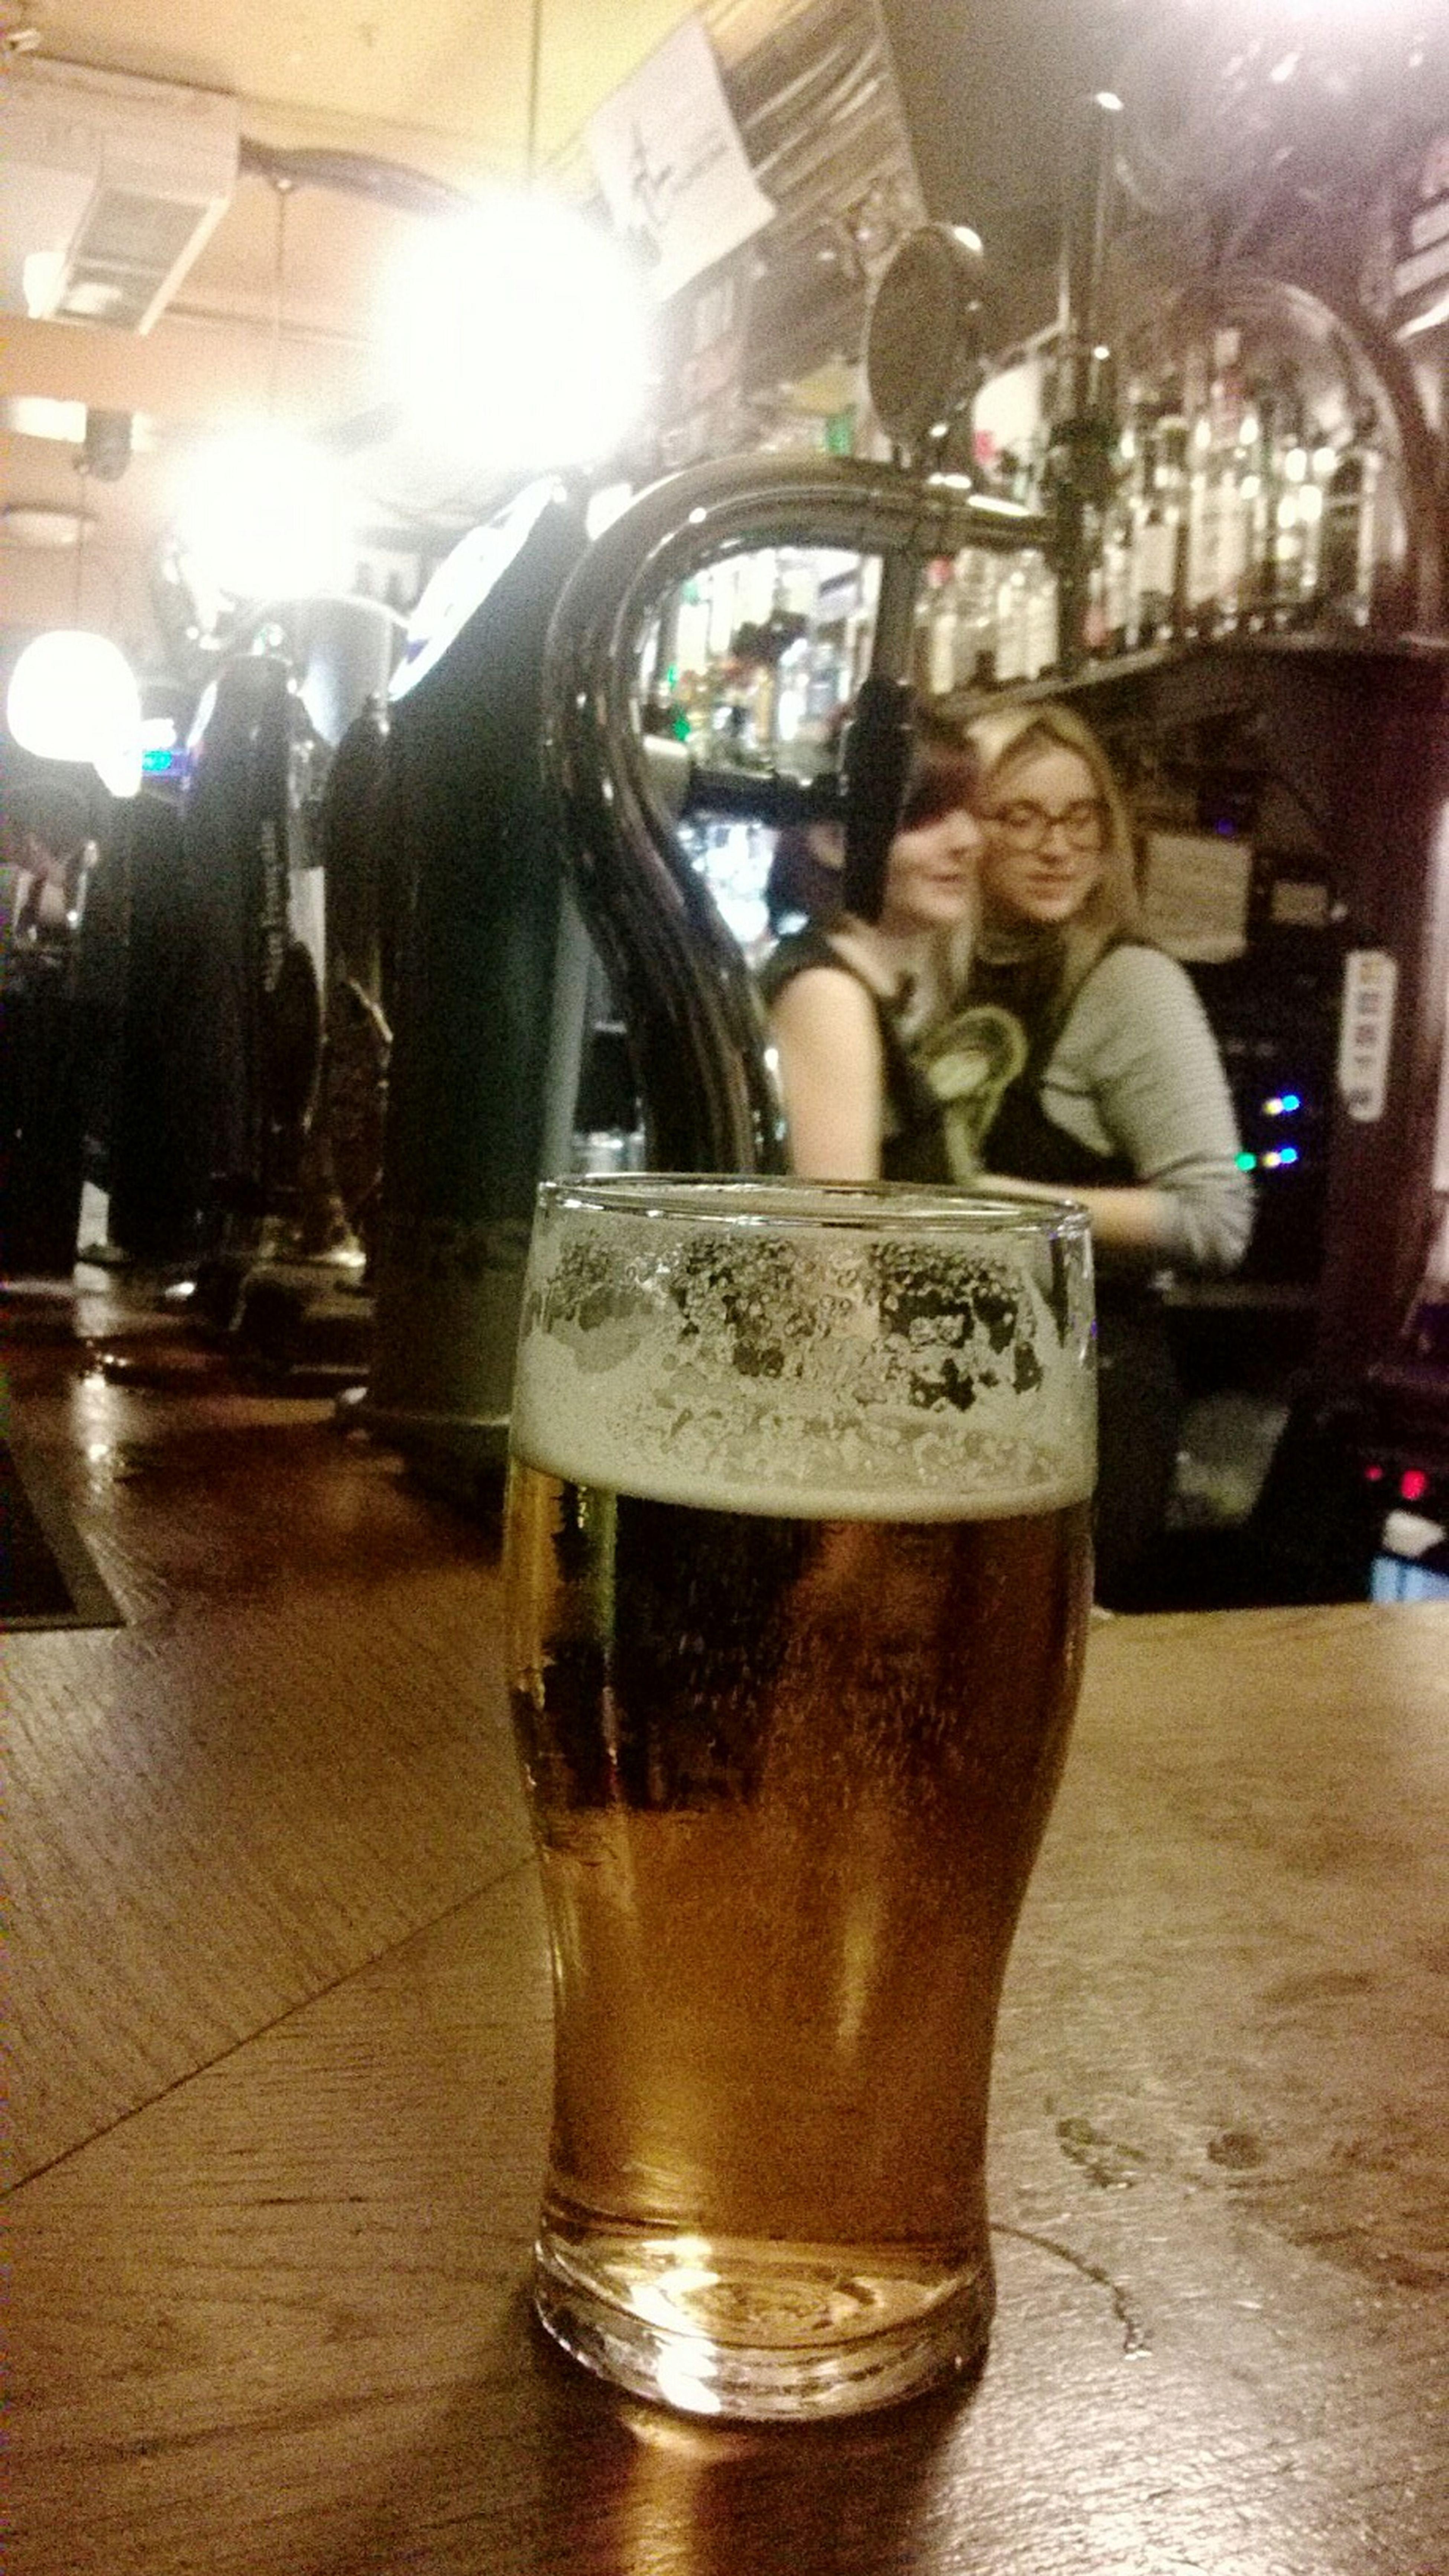 Beer Beer Time Beer O'clock Camden Town Pub Pint Glass Elwphants Head Camden London Pub LONDON❤ Londonlife Taking Photos Beerporn Beer Glass Beerlover Beer - Alcohol